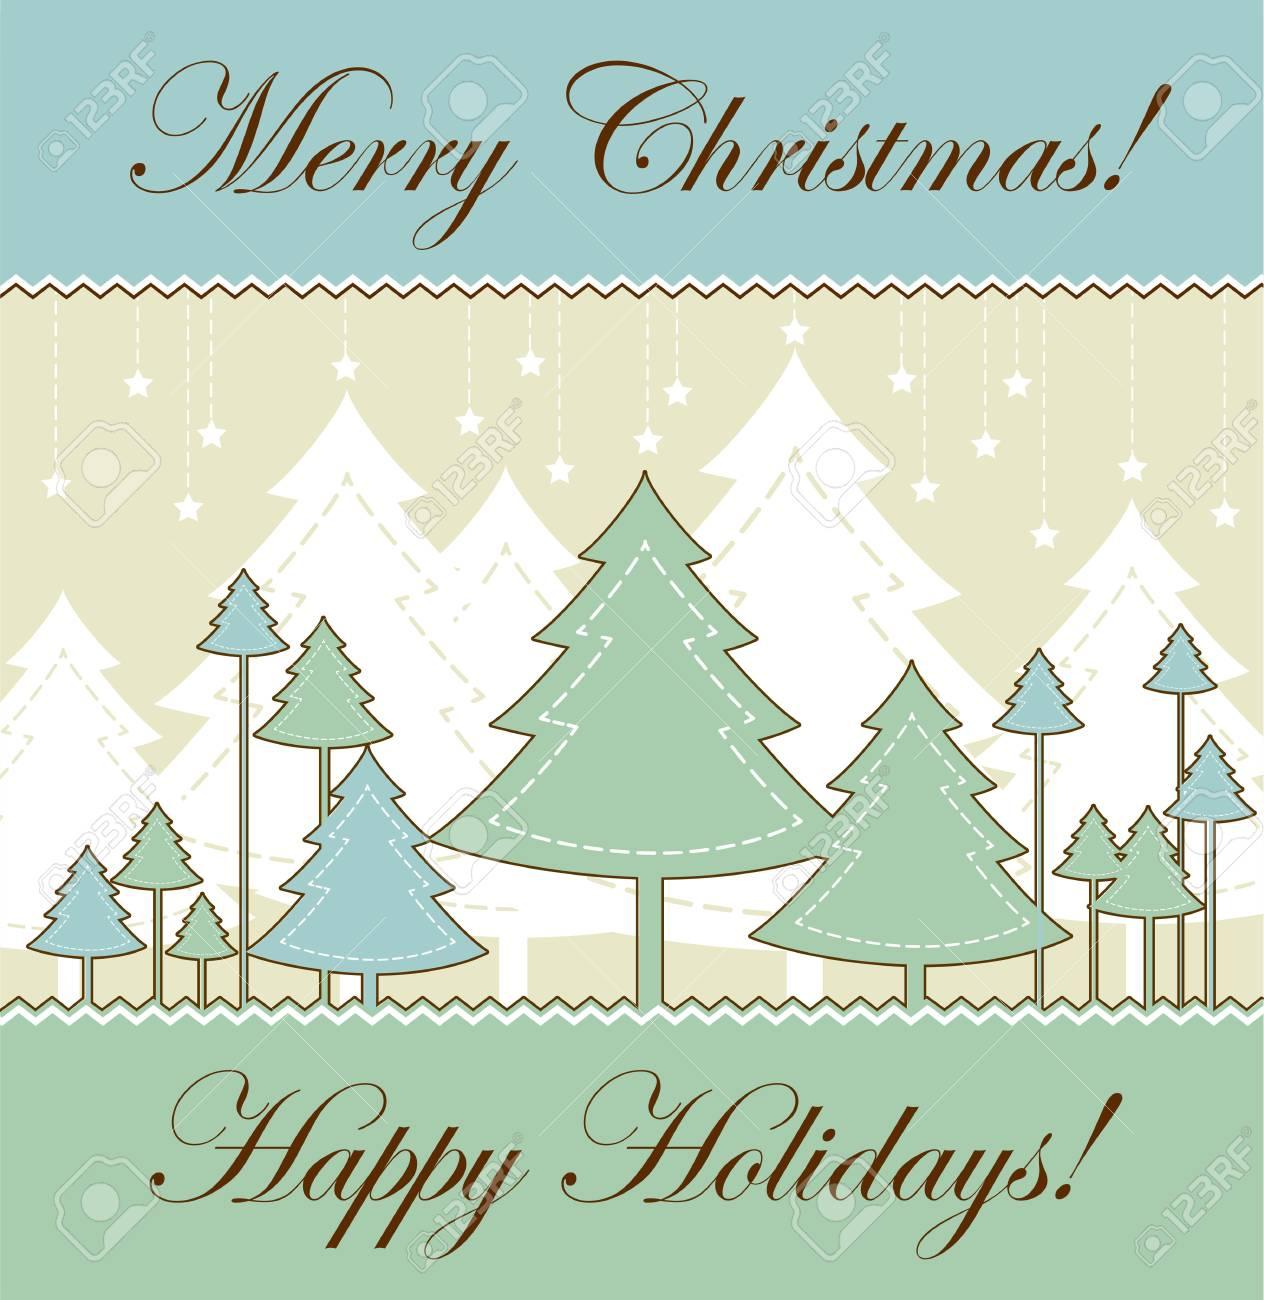 vintage Christmas card - retro style vector illustration Stock Vector - 11081851